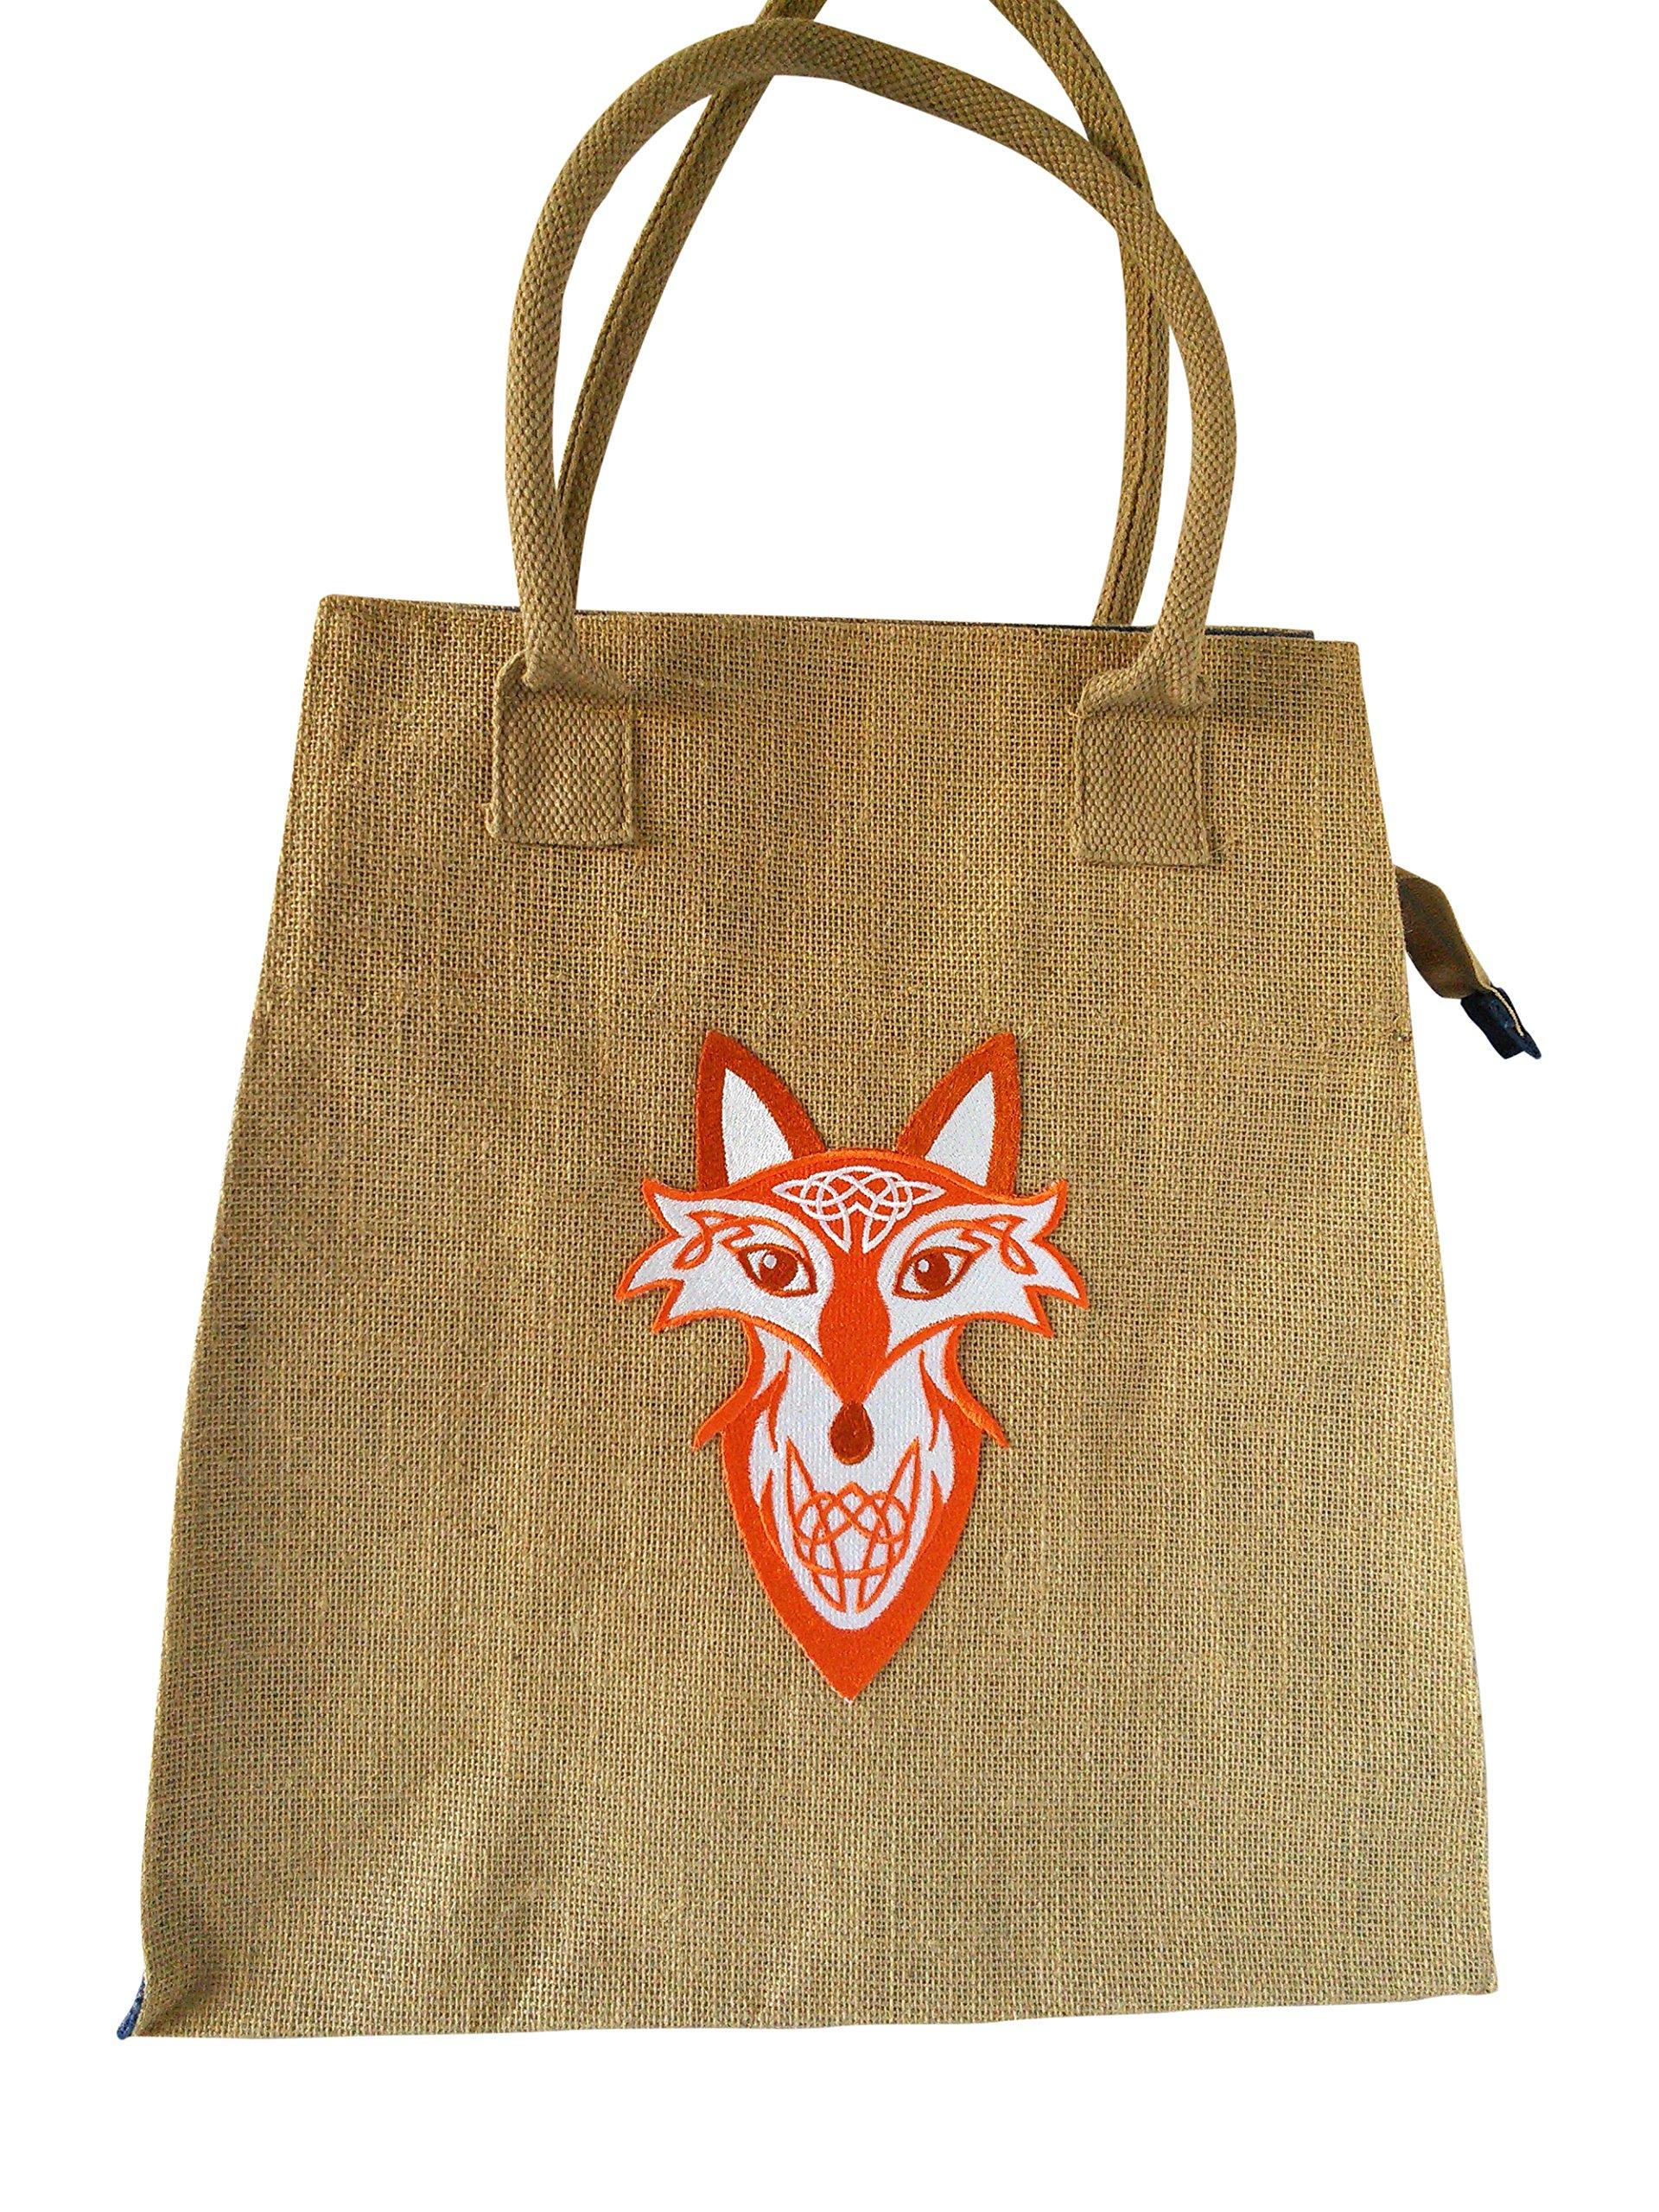 Celtic Fox Jute Bag With Blue Side Panel - handmade-bags